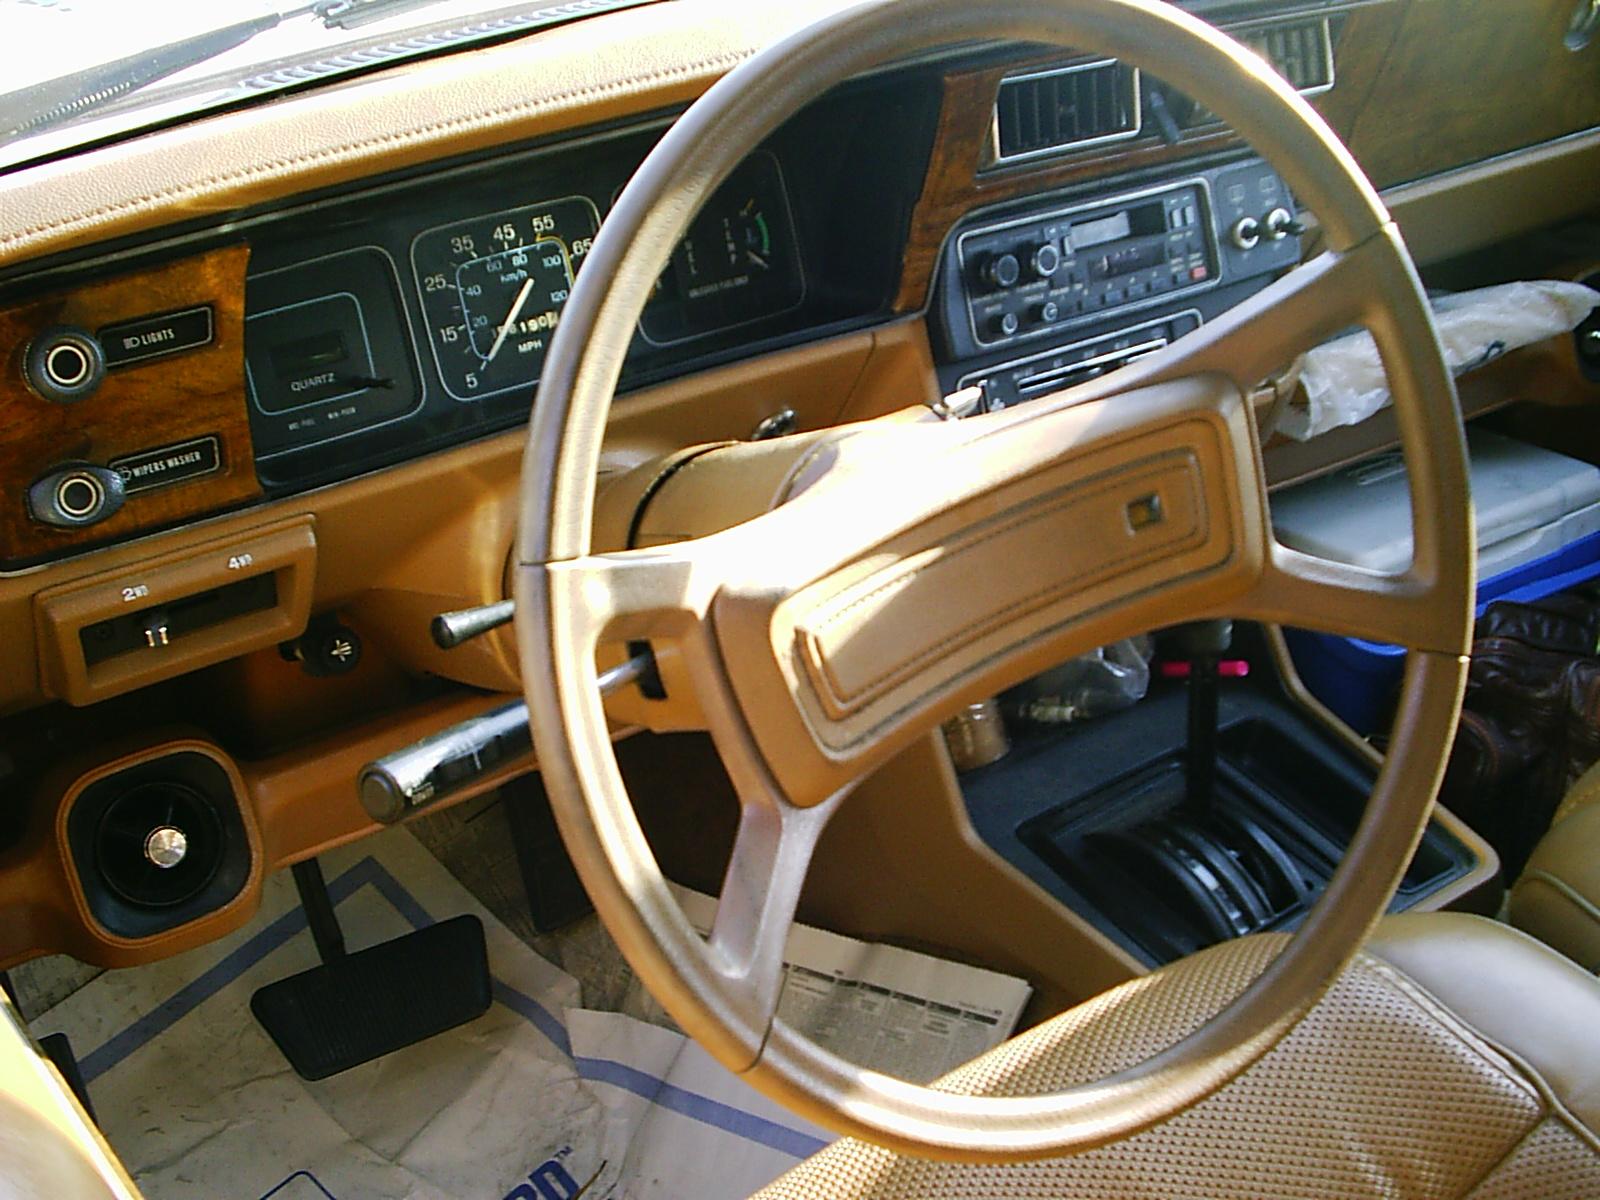 File:AMC Eagle wagon burgundy wood umi.jpg - Wikimedia Commons